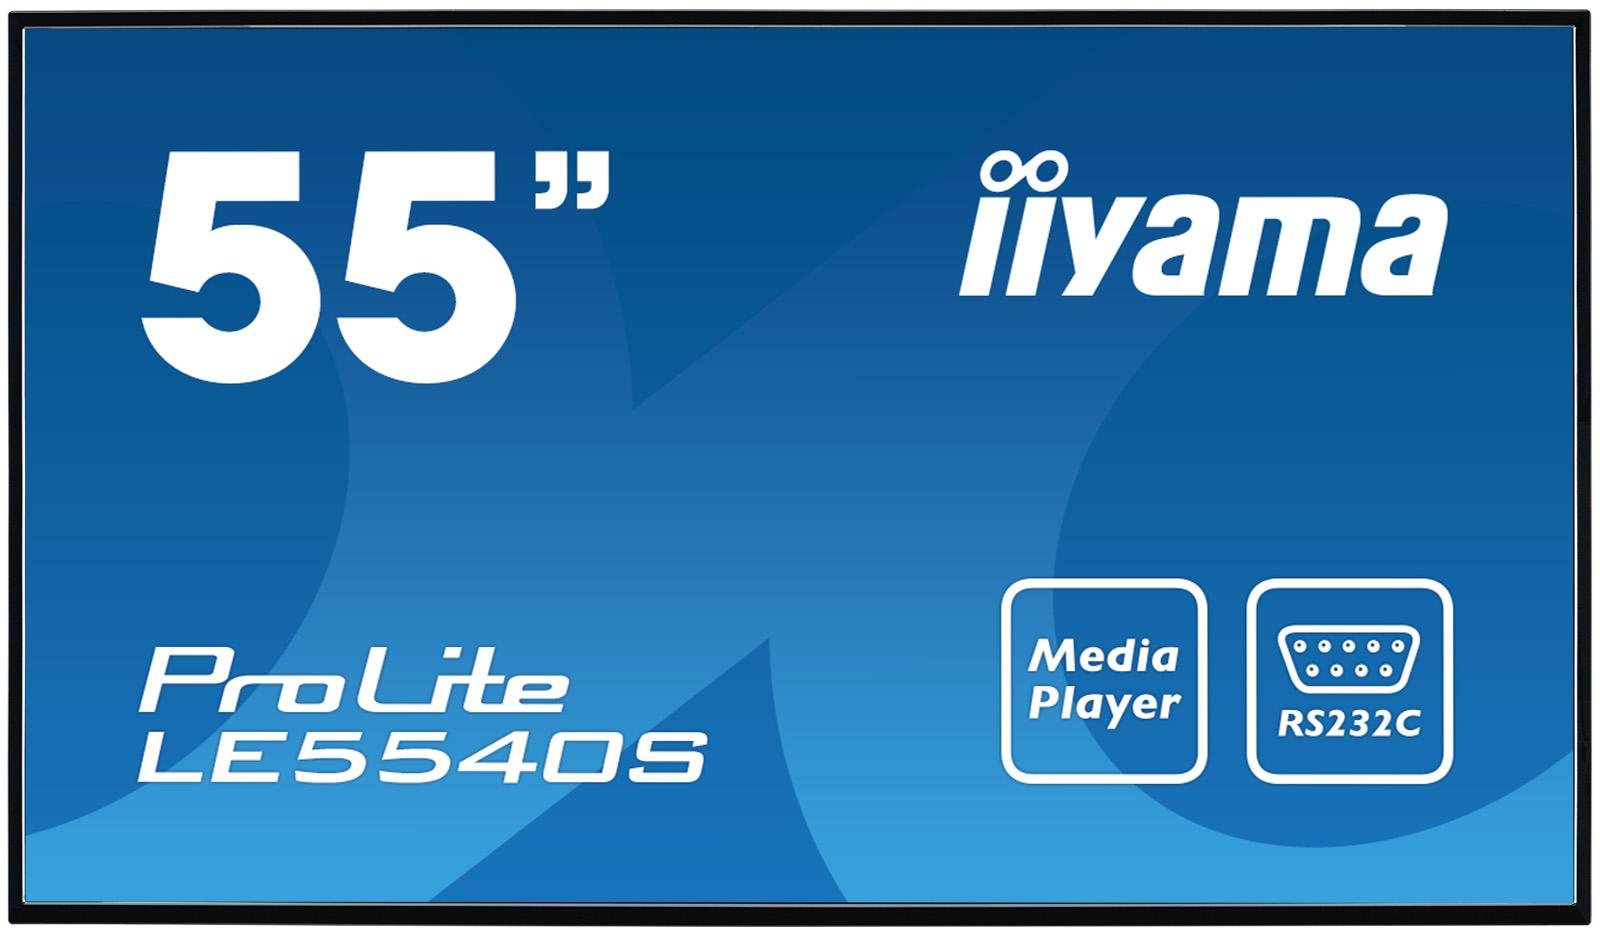 "55"" LCD iiyama ProLite LE5540S-B1 -FullHD,IPS, 8ms, 350cd, USB 2.0 media player, RJ45, RS232C,repro"